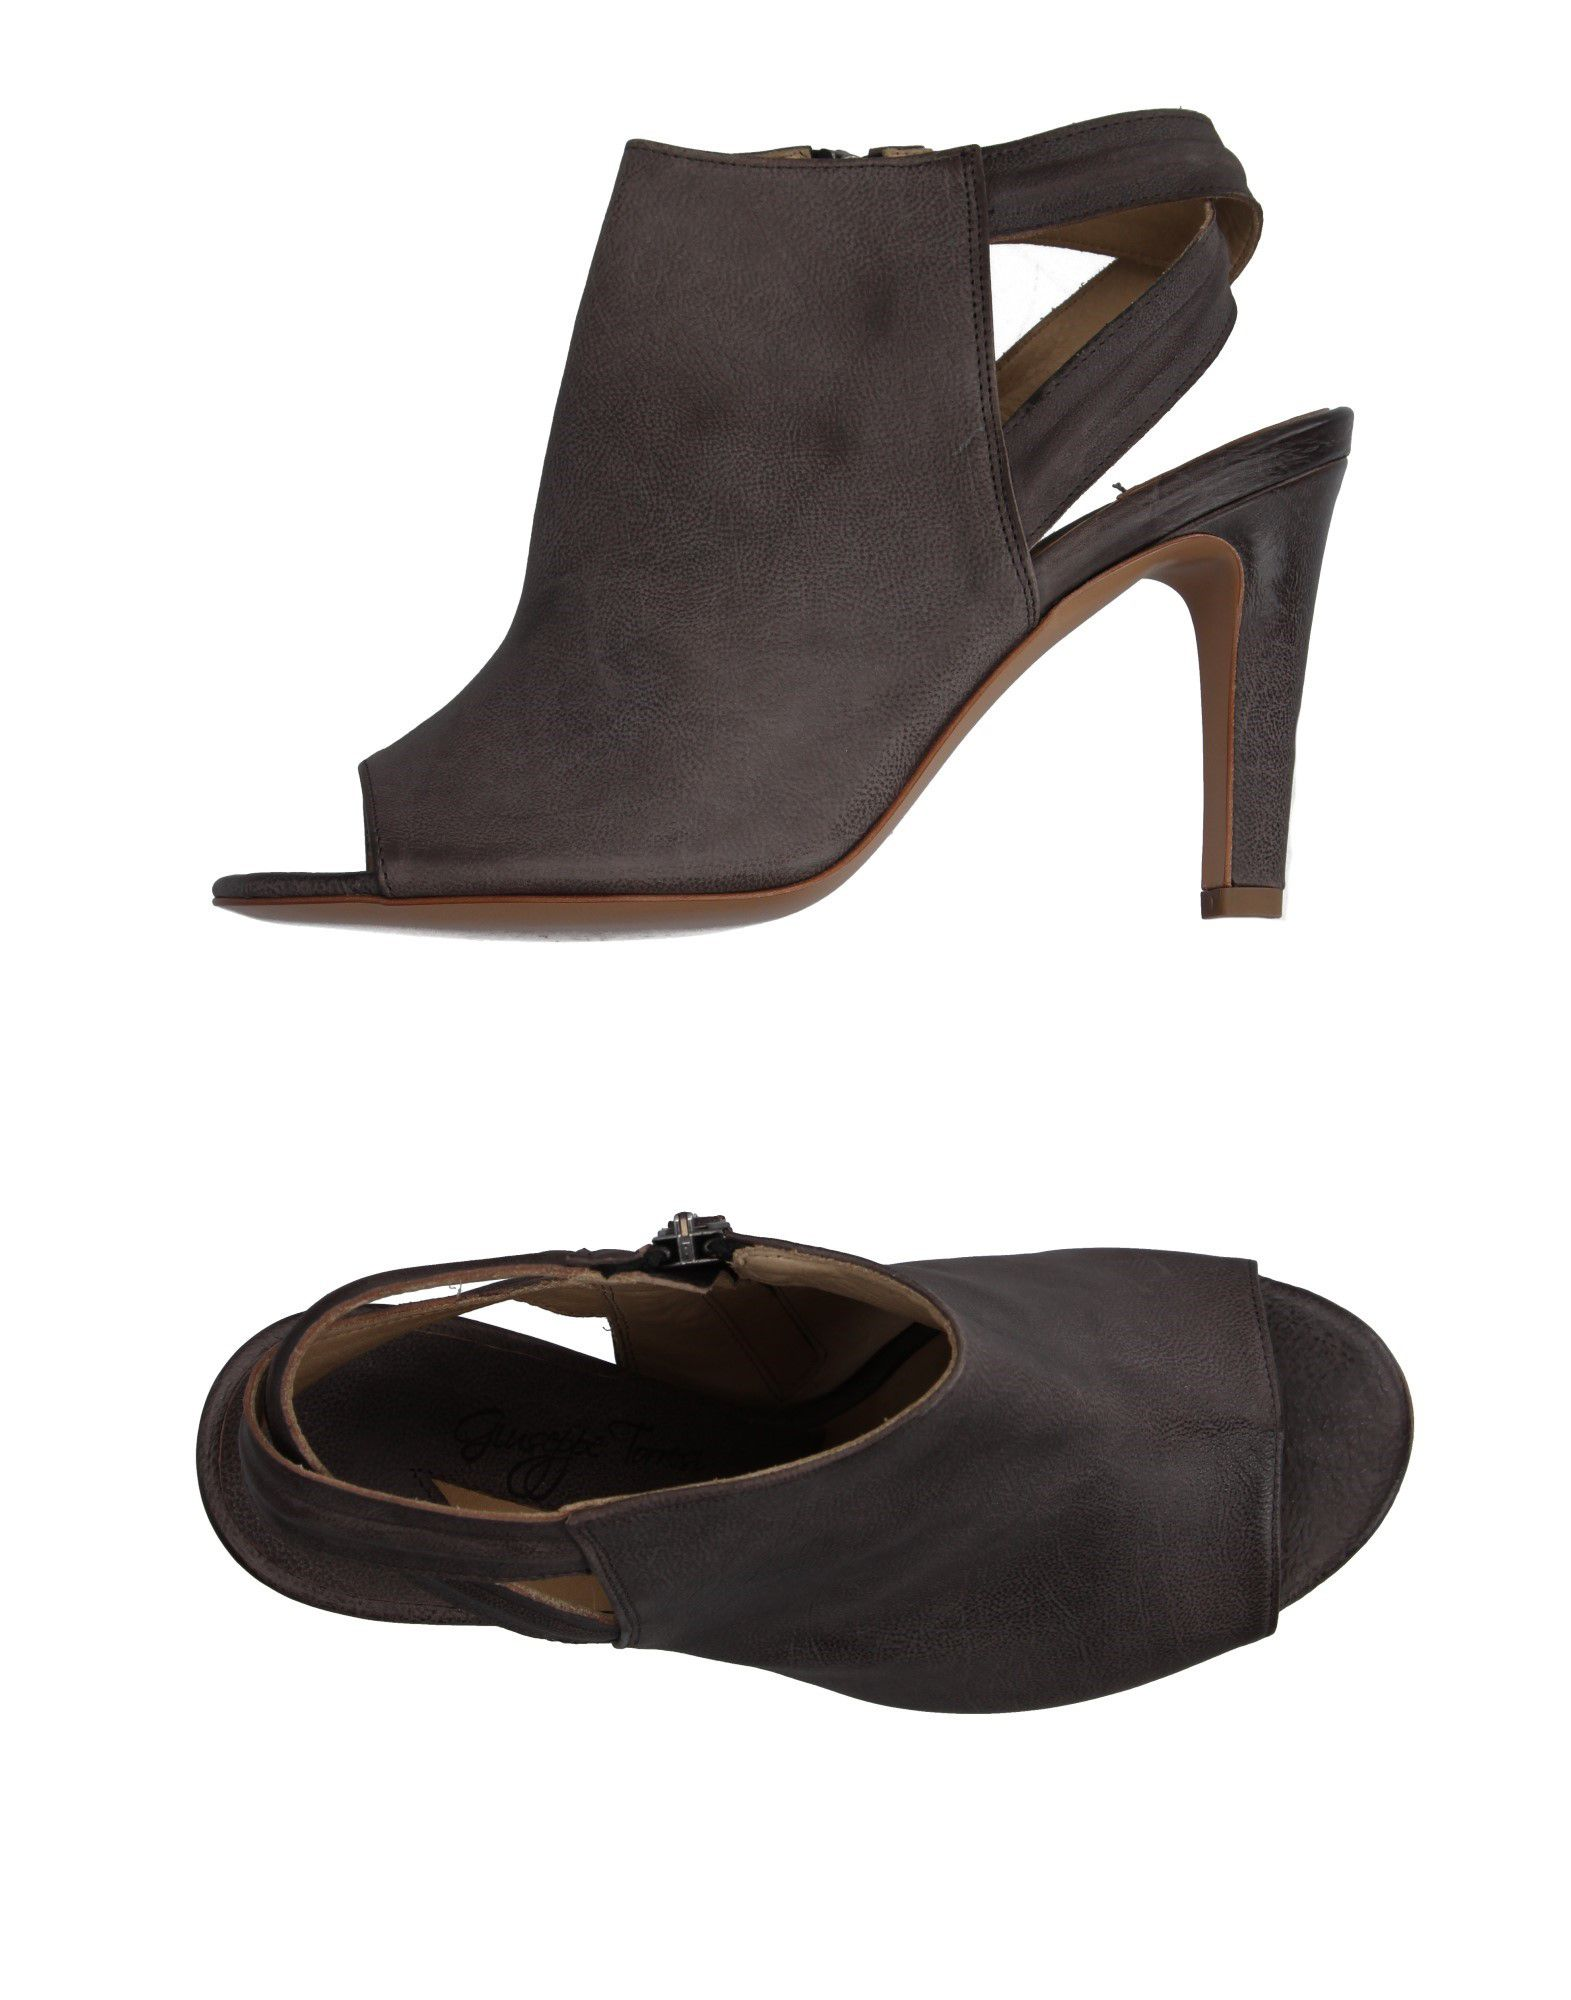 GIUSEPPE TORRESI Sandals in Grey